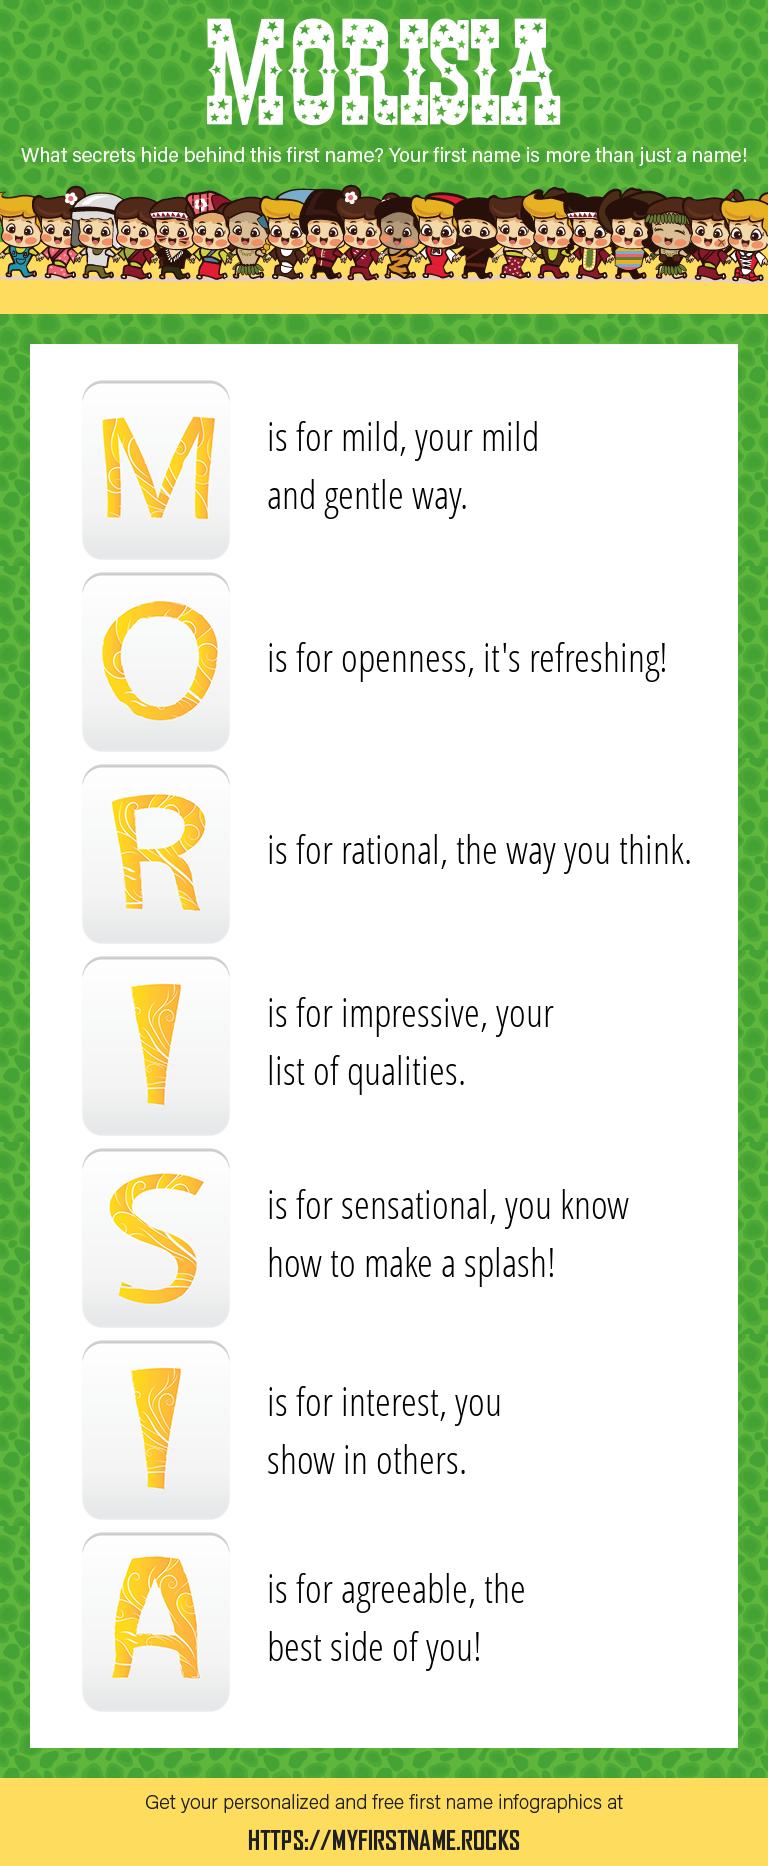 Morisia Infographics